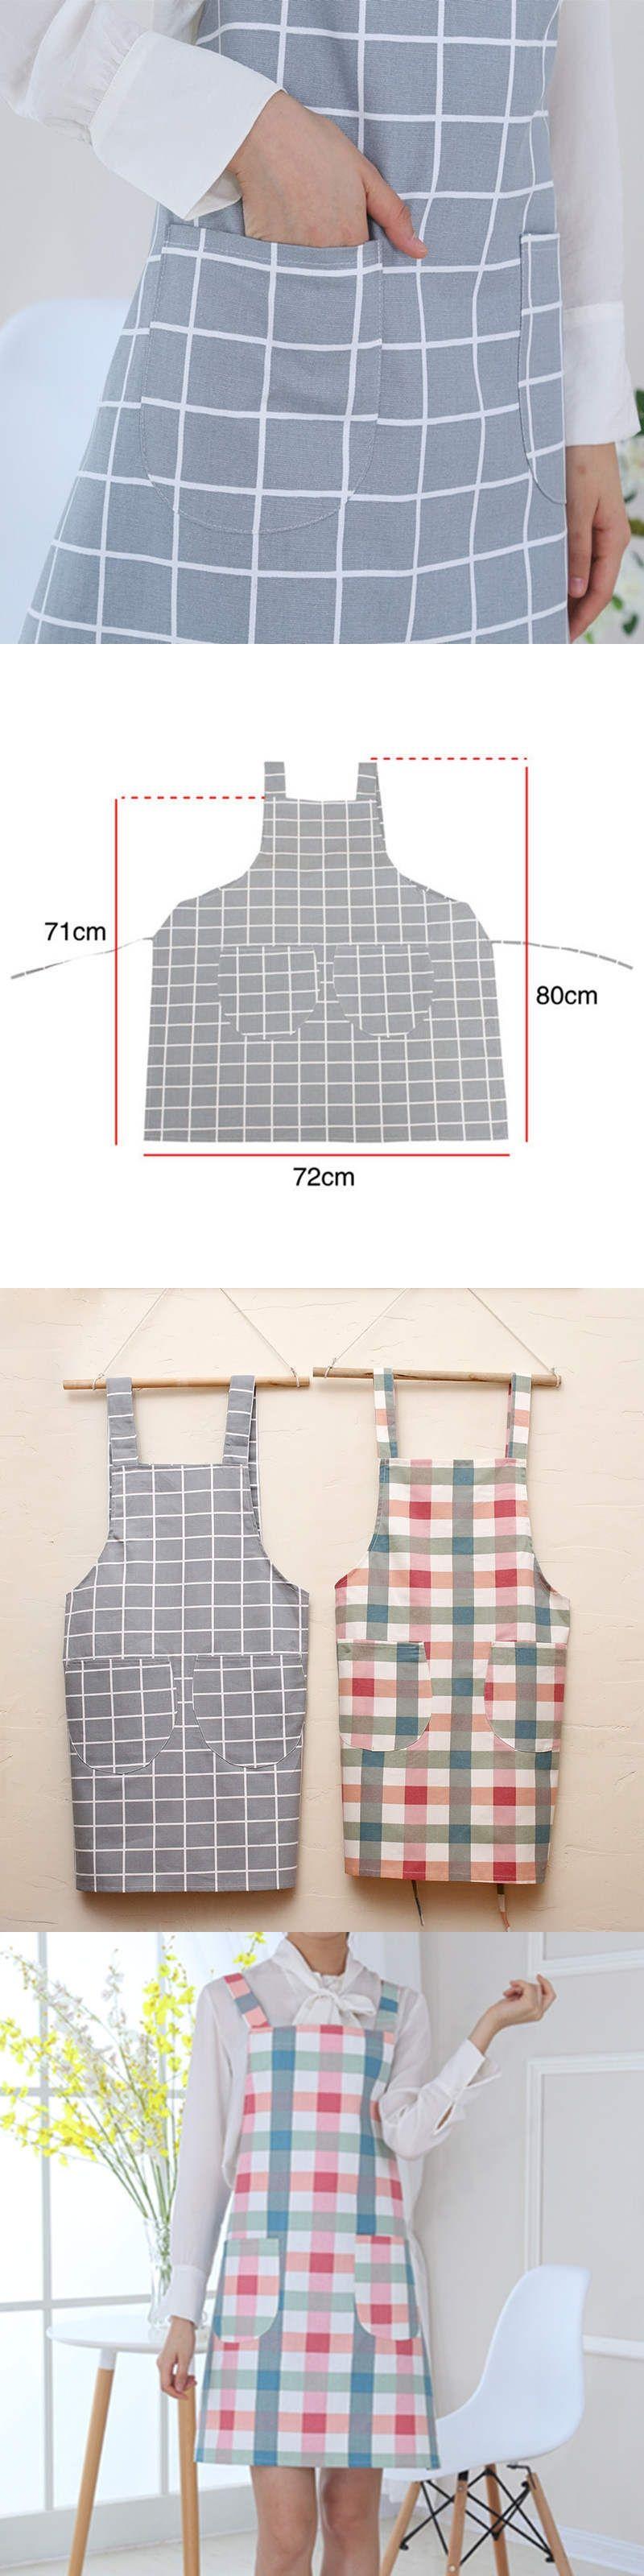 Doreenbeads antifouling apron grid checkered pattern kitchen